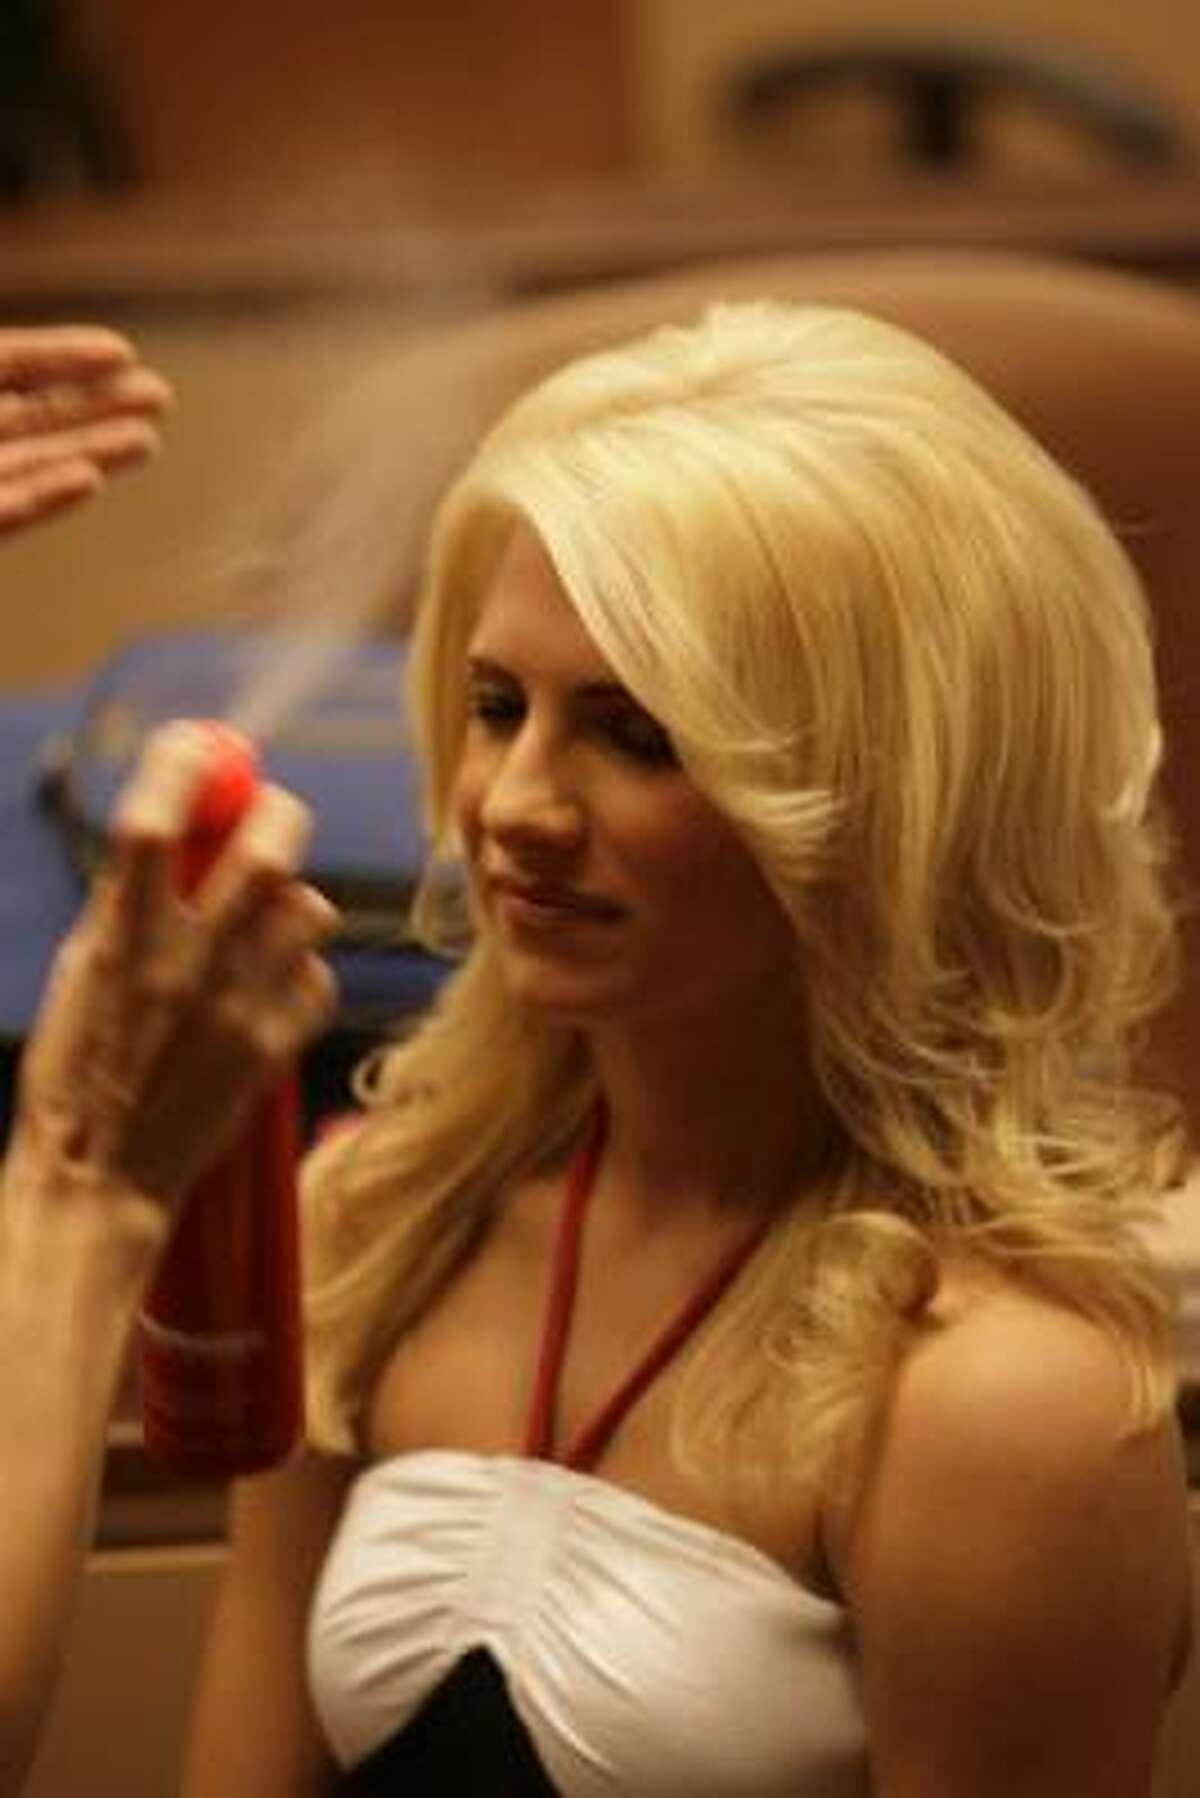 Candice, a Texans cheerleader, is hair-sprayed before her photo shoot for the Houston Texans Cheerleaders Swimsuit Calendar.